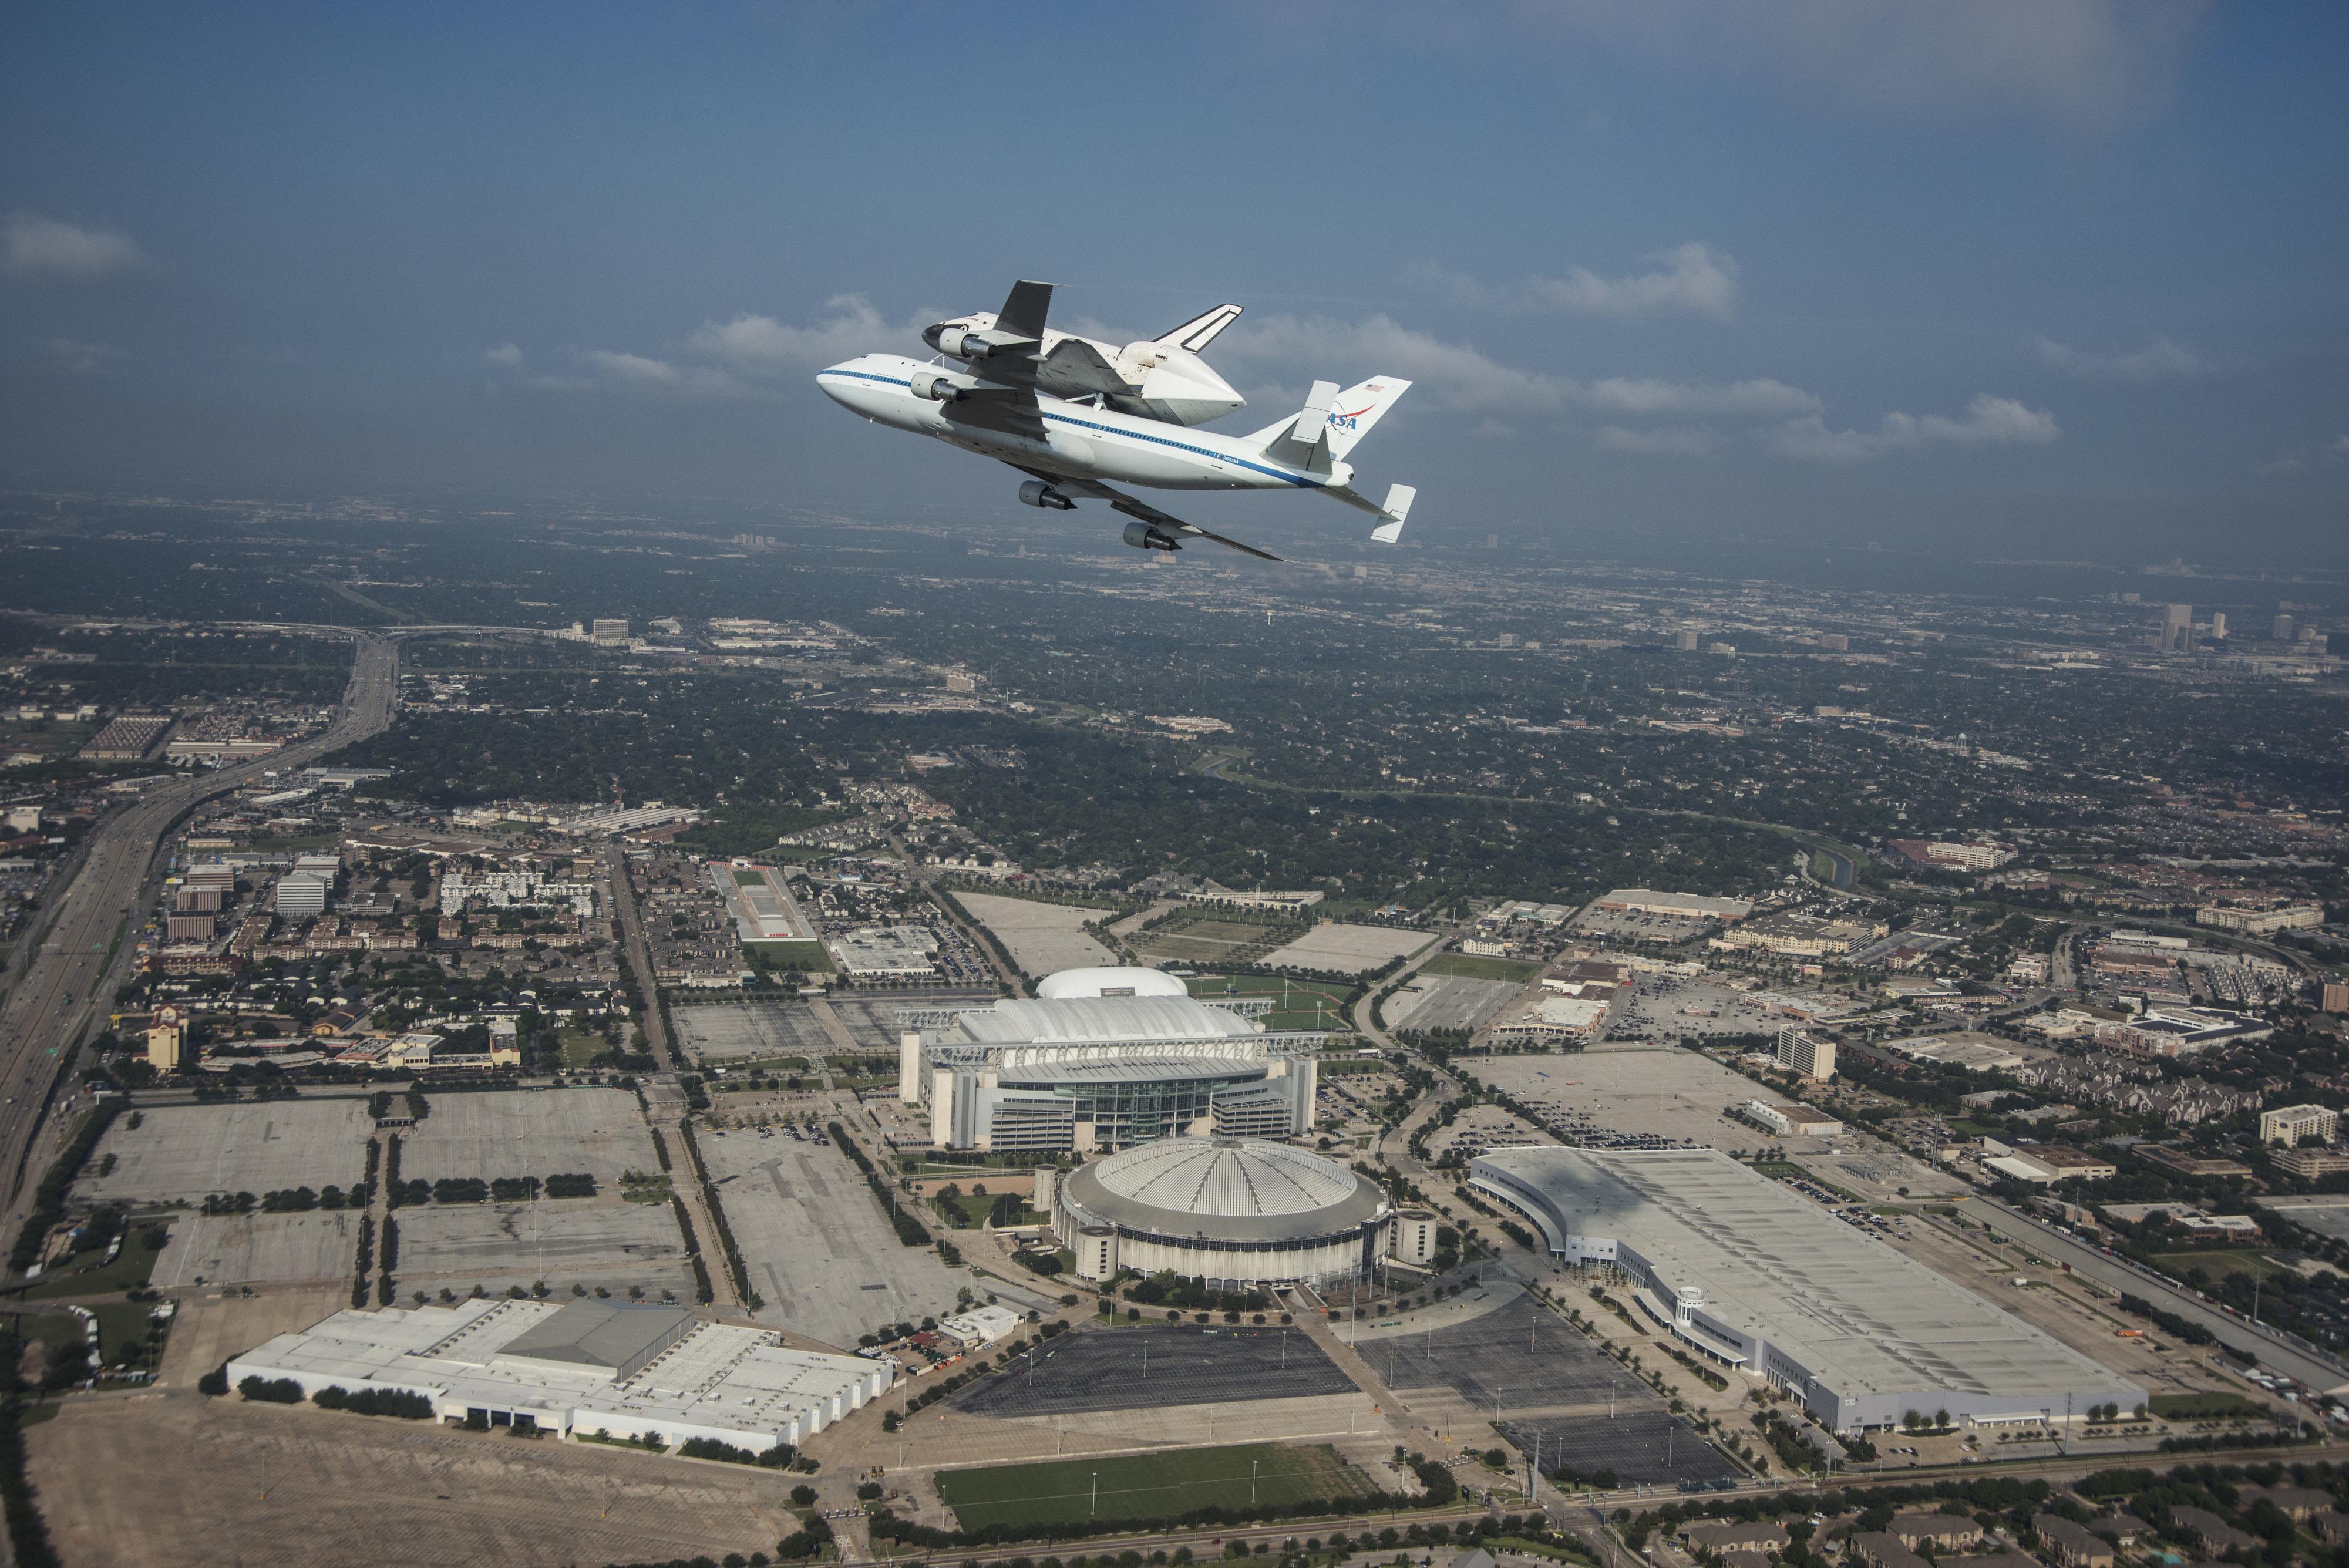 space shuttle endeavour nasa - photo #22